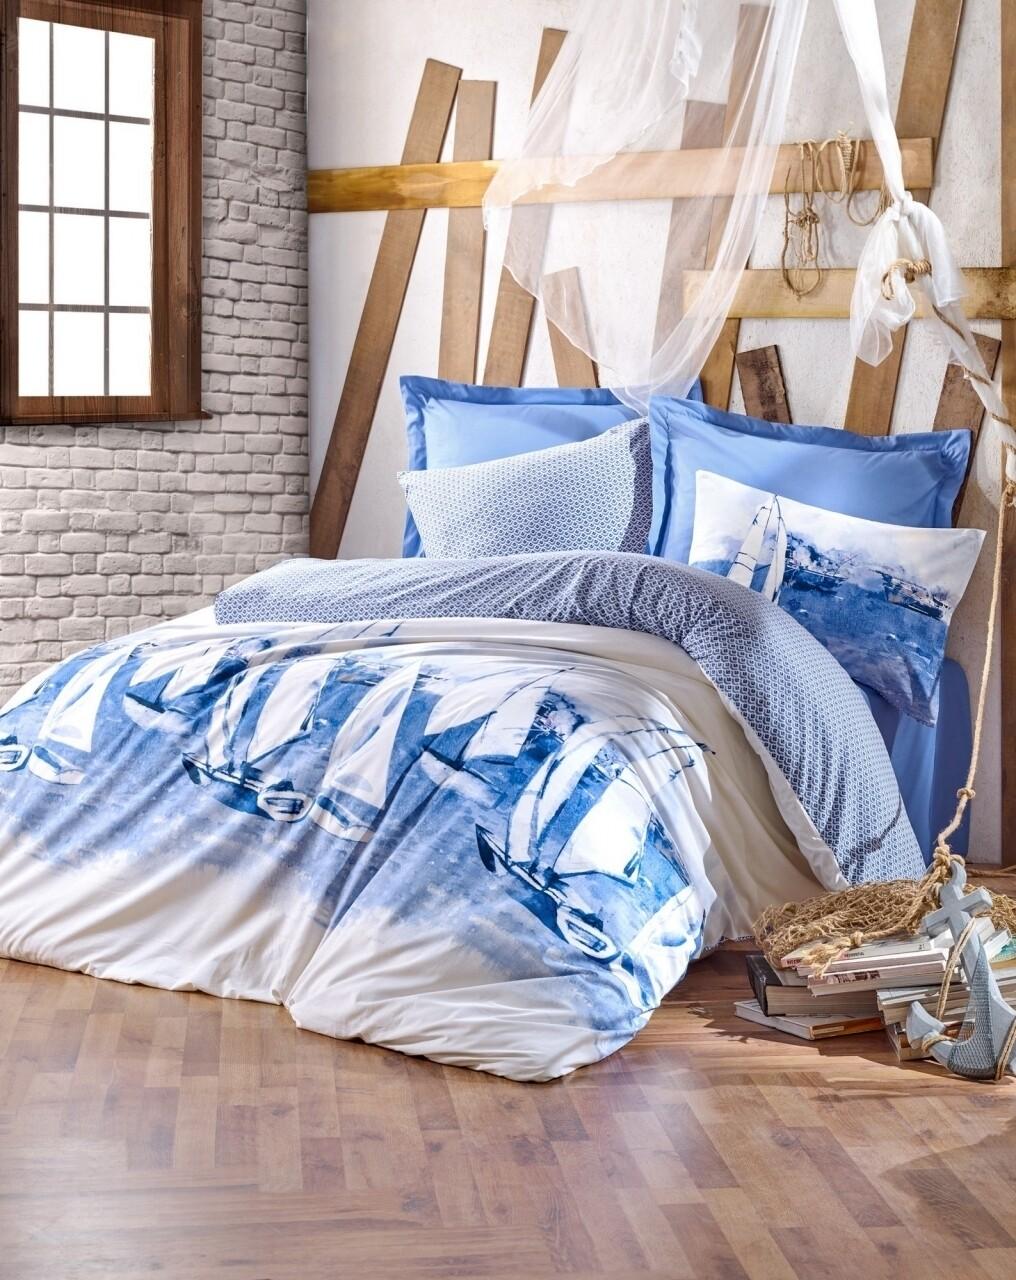 Lenjerie de pat pentru o persoana, 3 piese, 100% bumbac ranforce, Cotton Box, Pusla